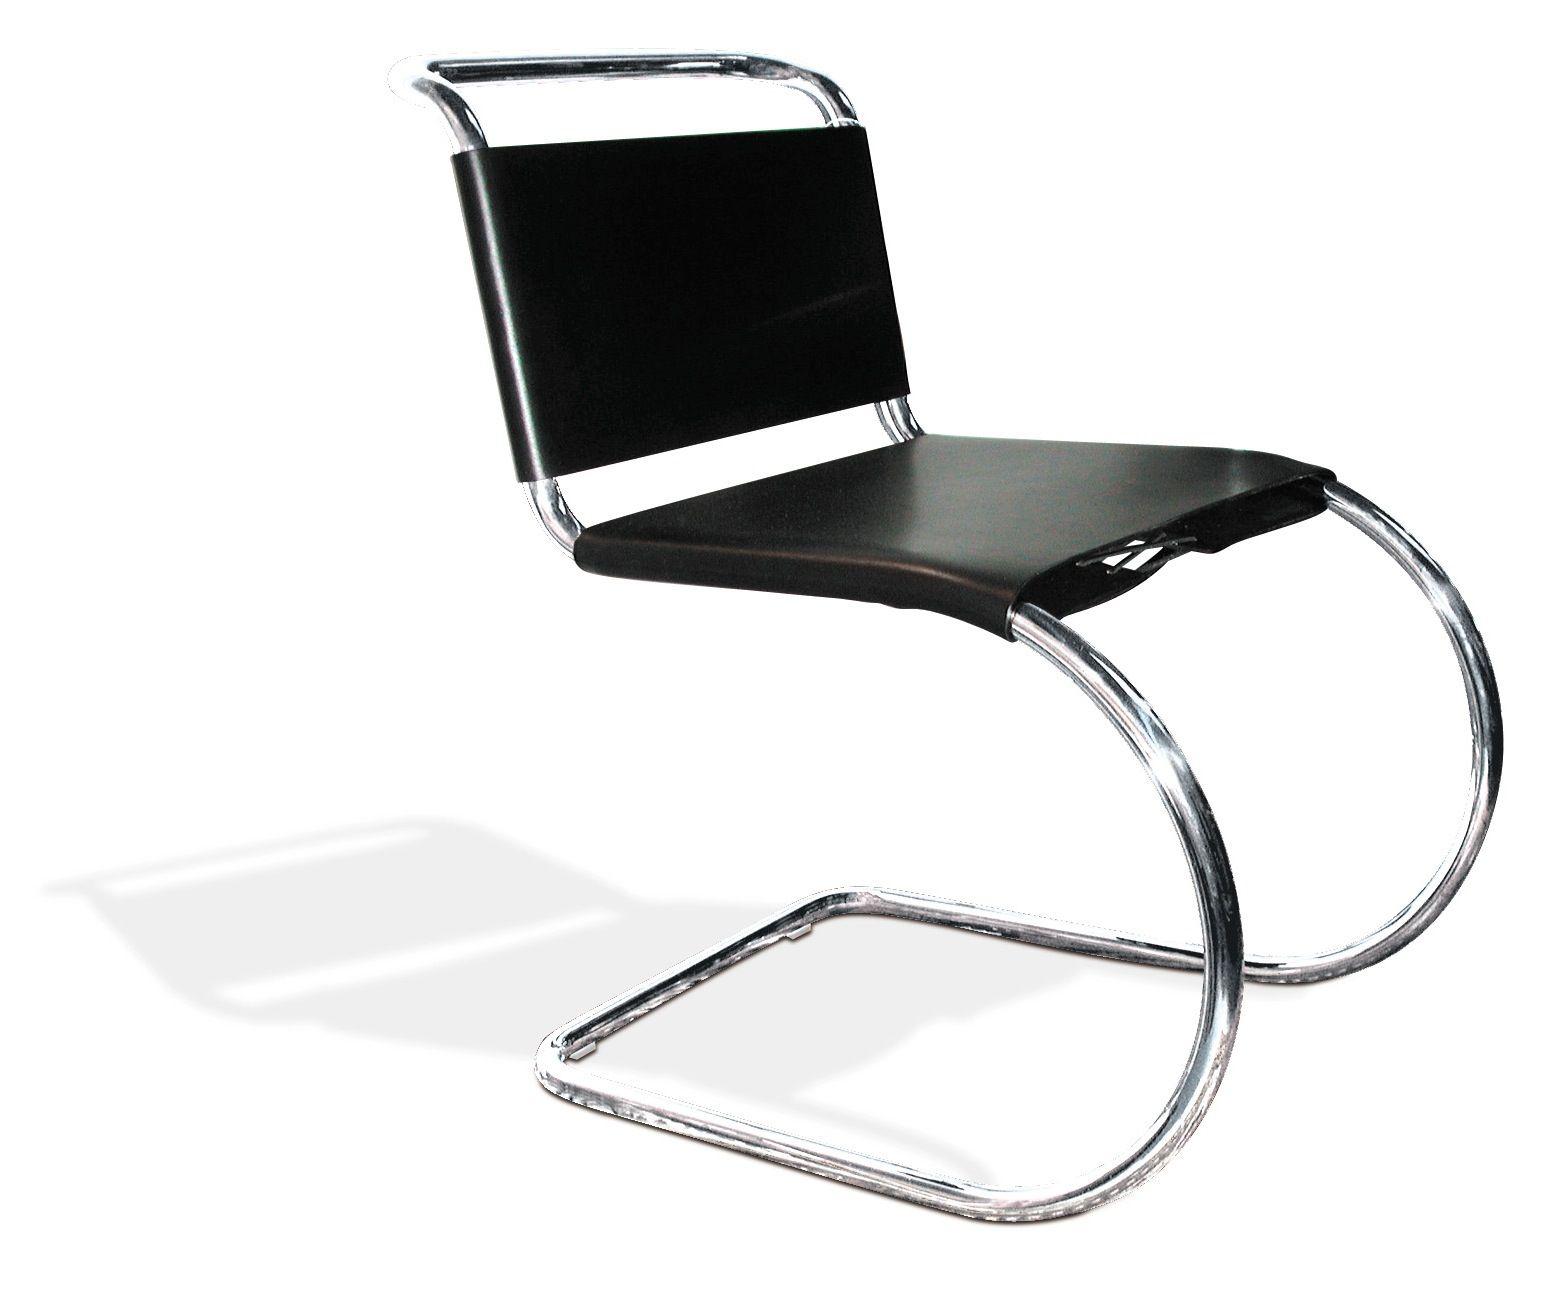 Mies van der rohe chair - Cantilever Chair Mies Van Der Rohe 1927